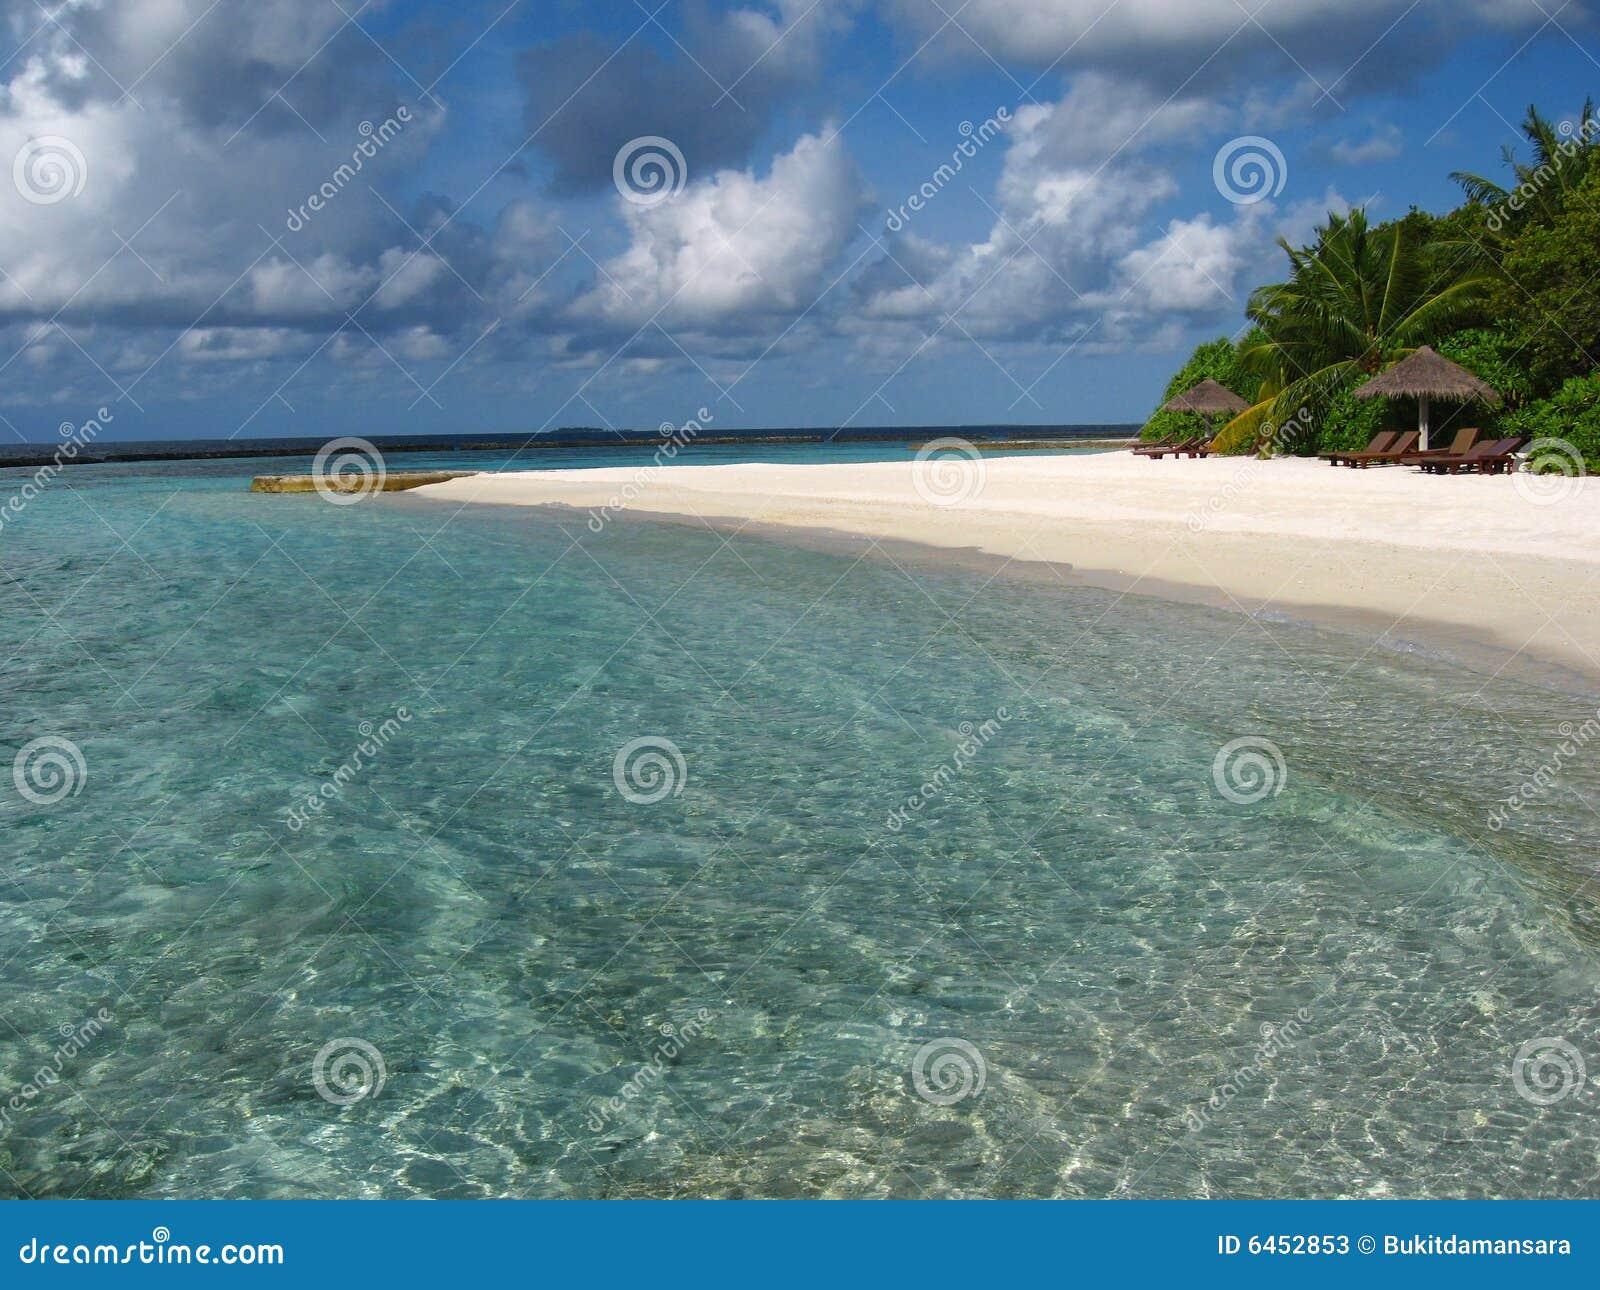 Nad morze na plaży